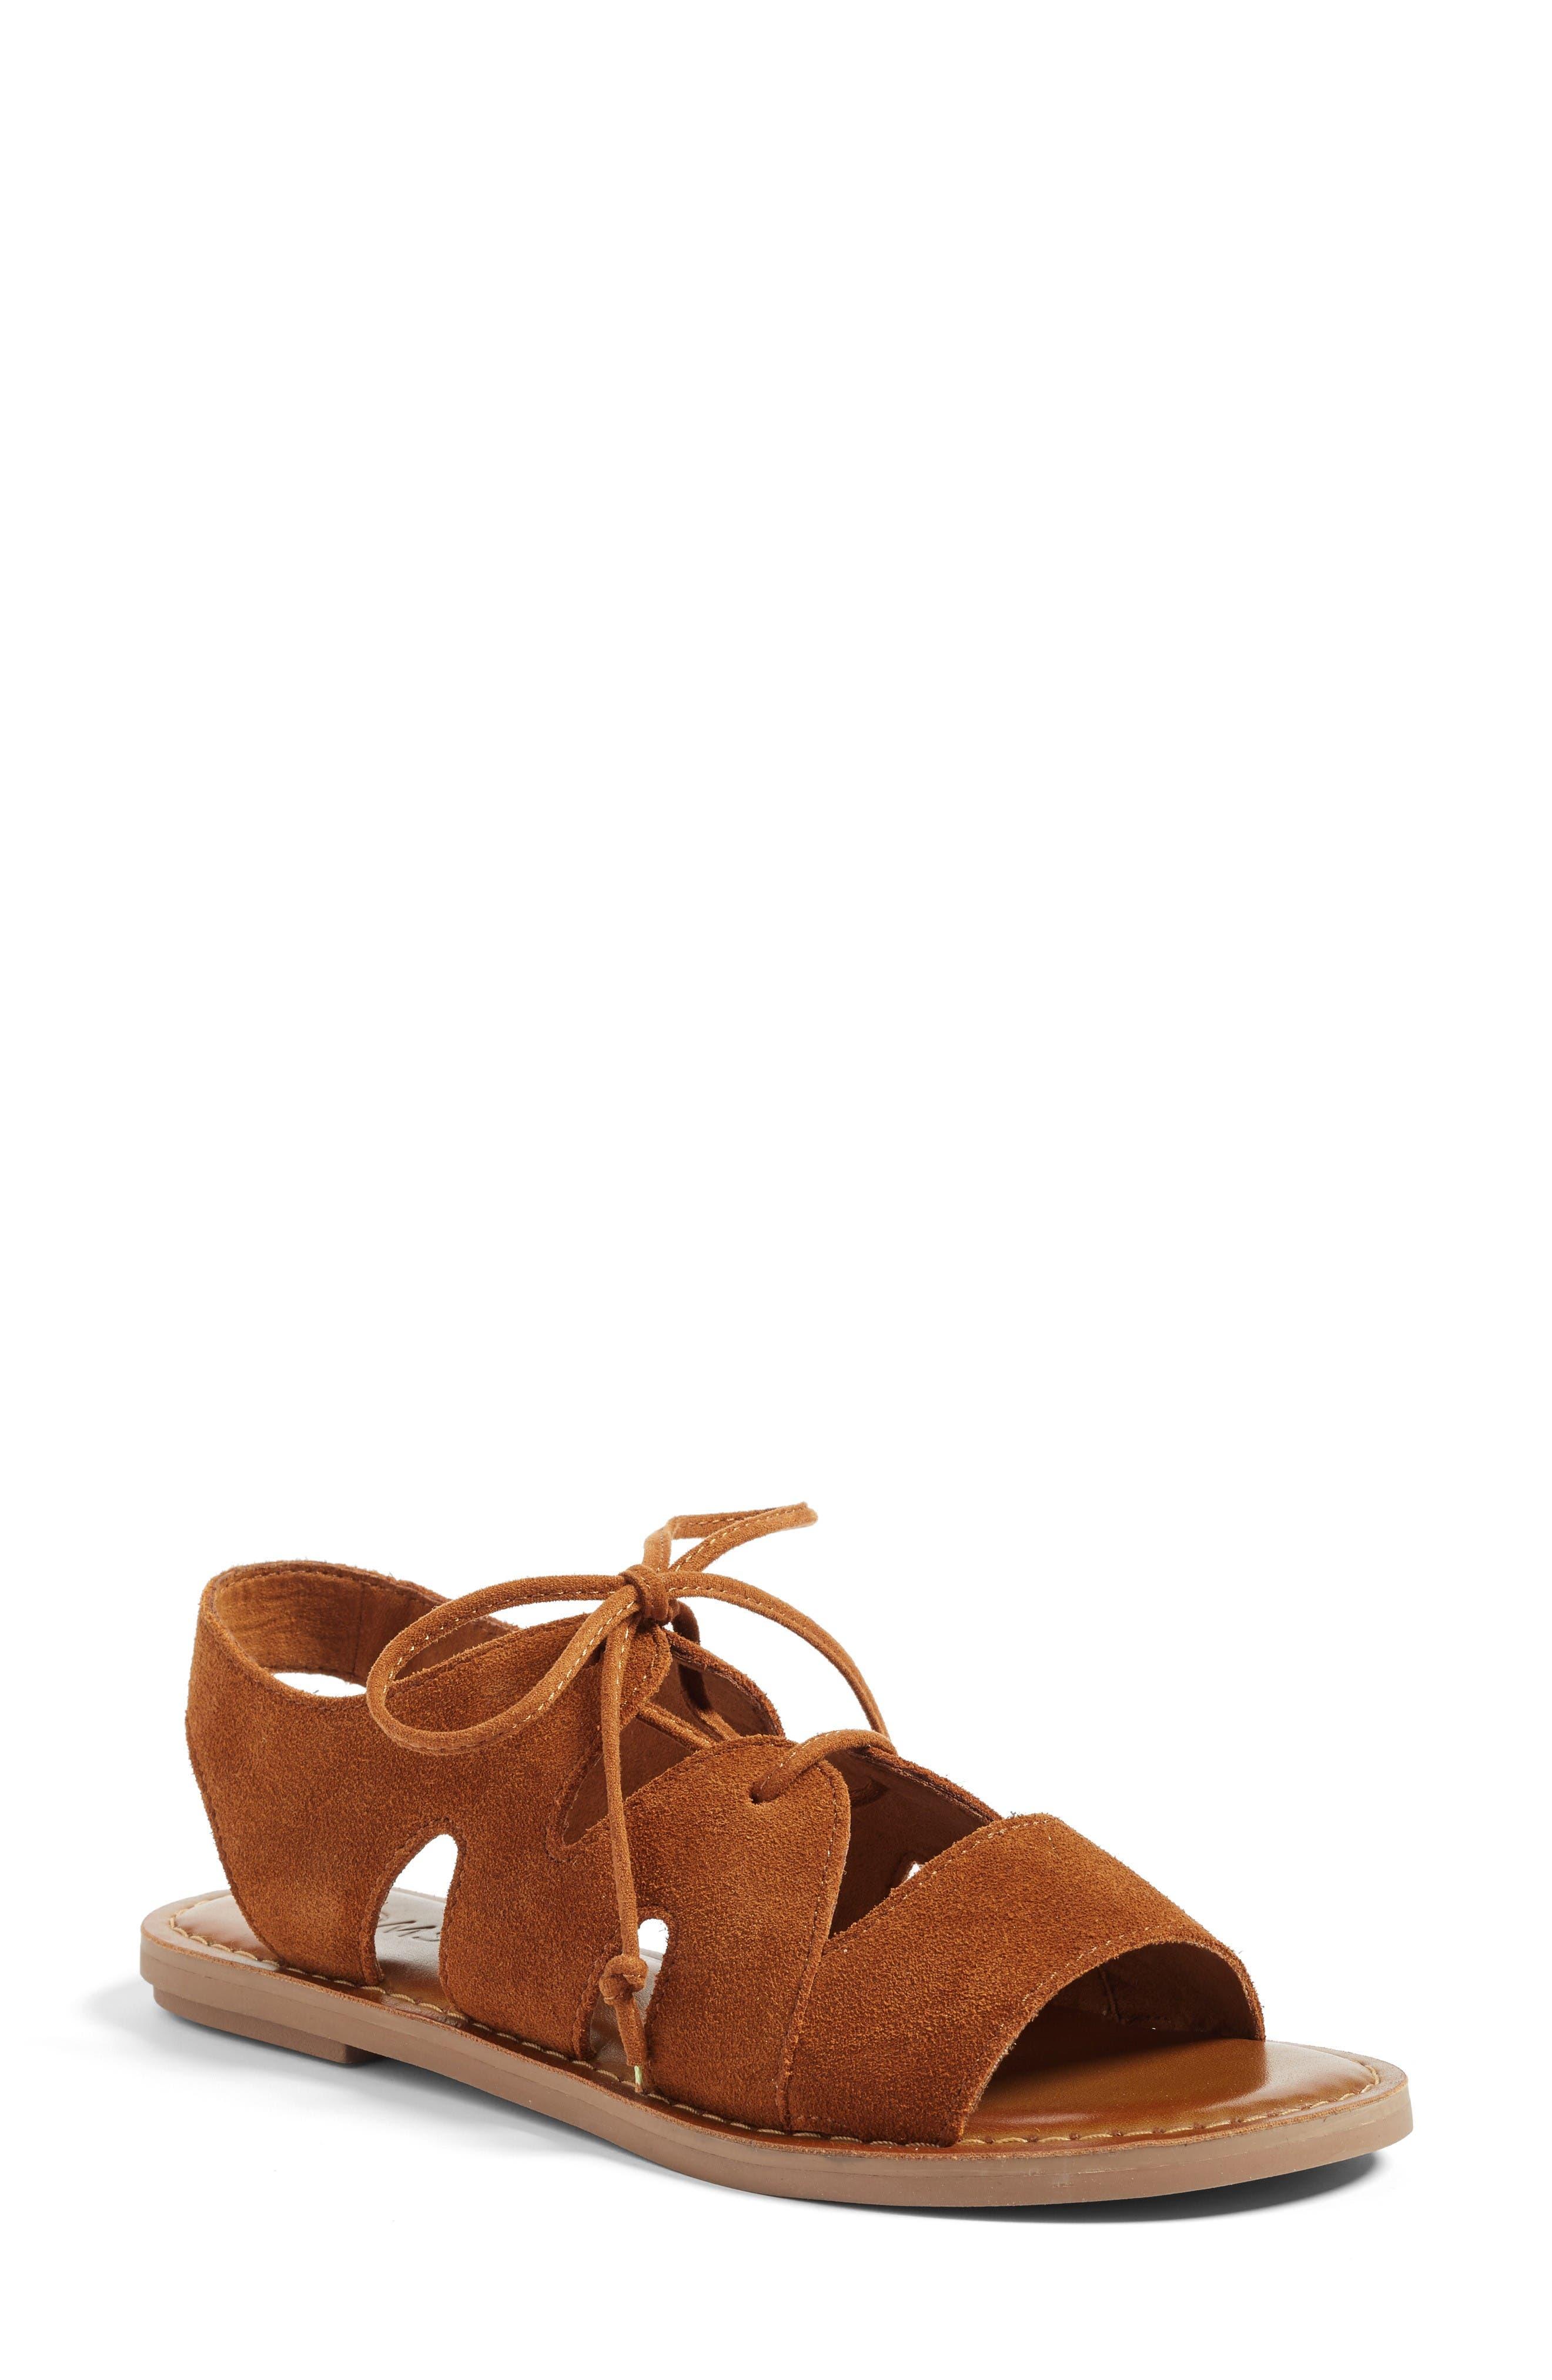 Alternate Image 1 Selected - TOMS Calips Sandal (Women)